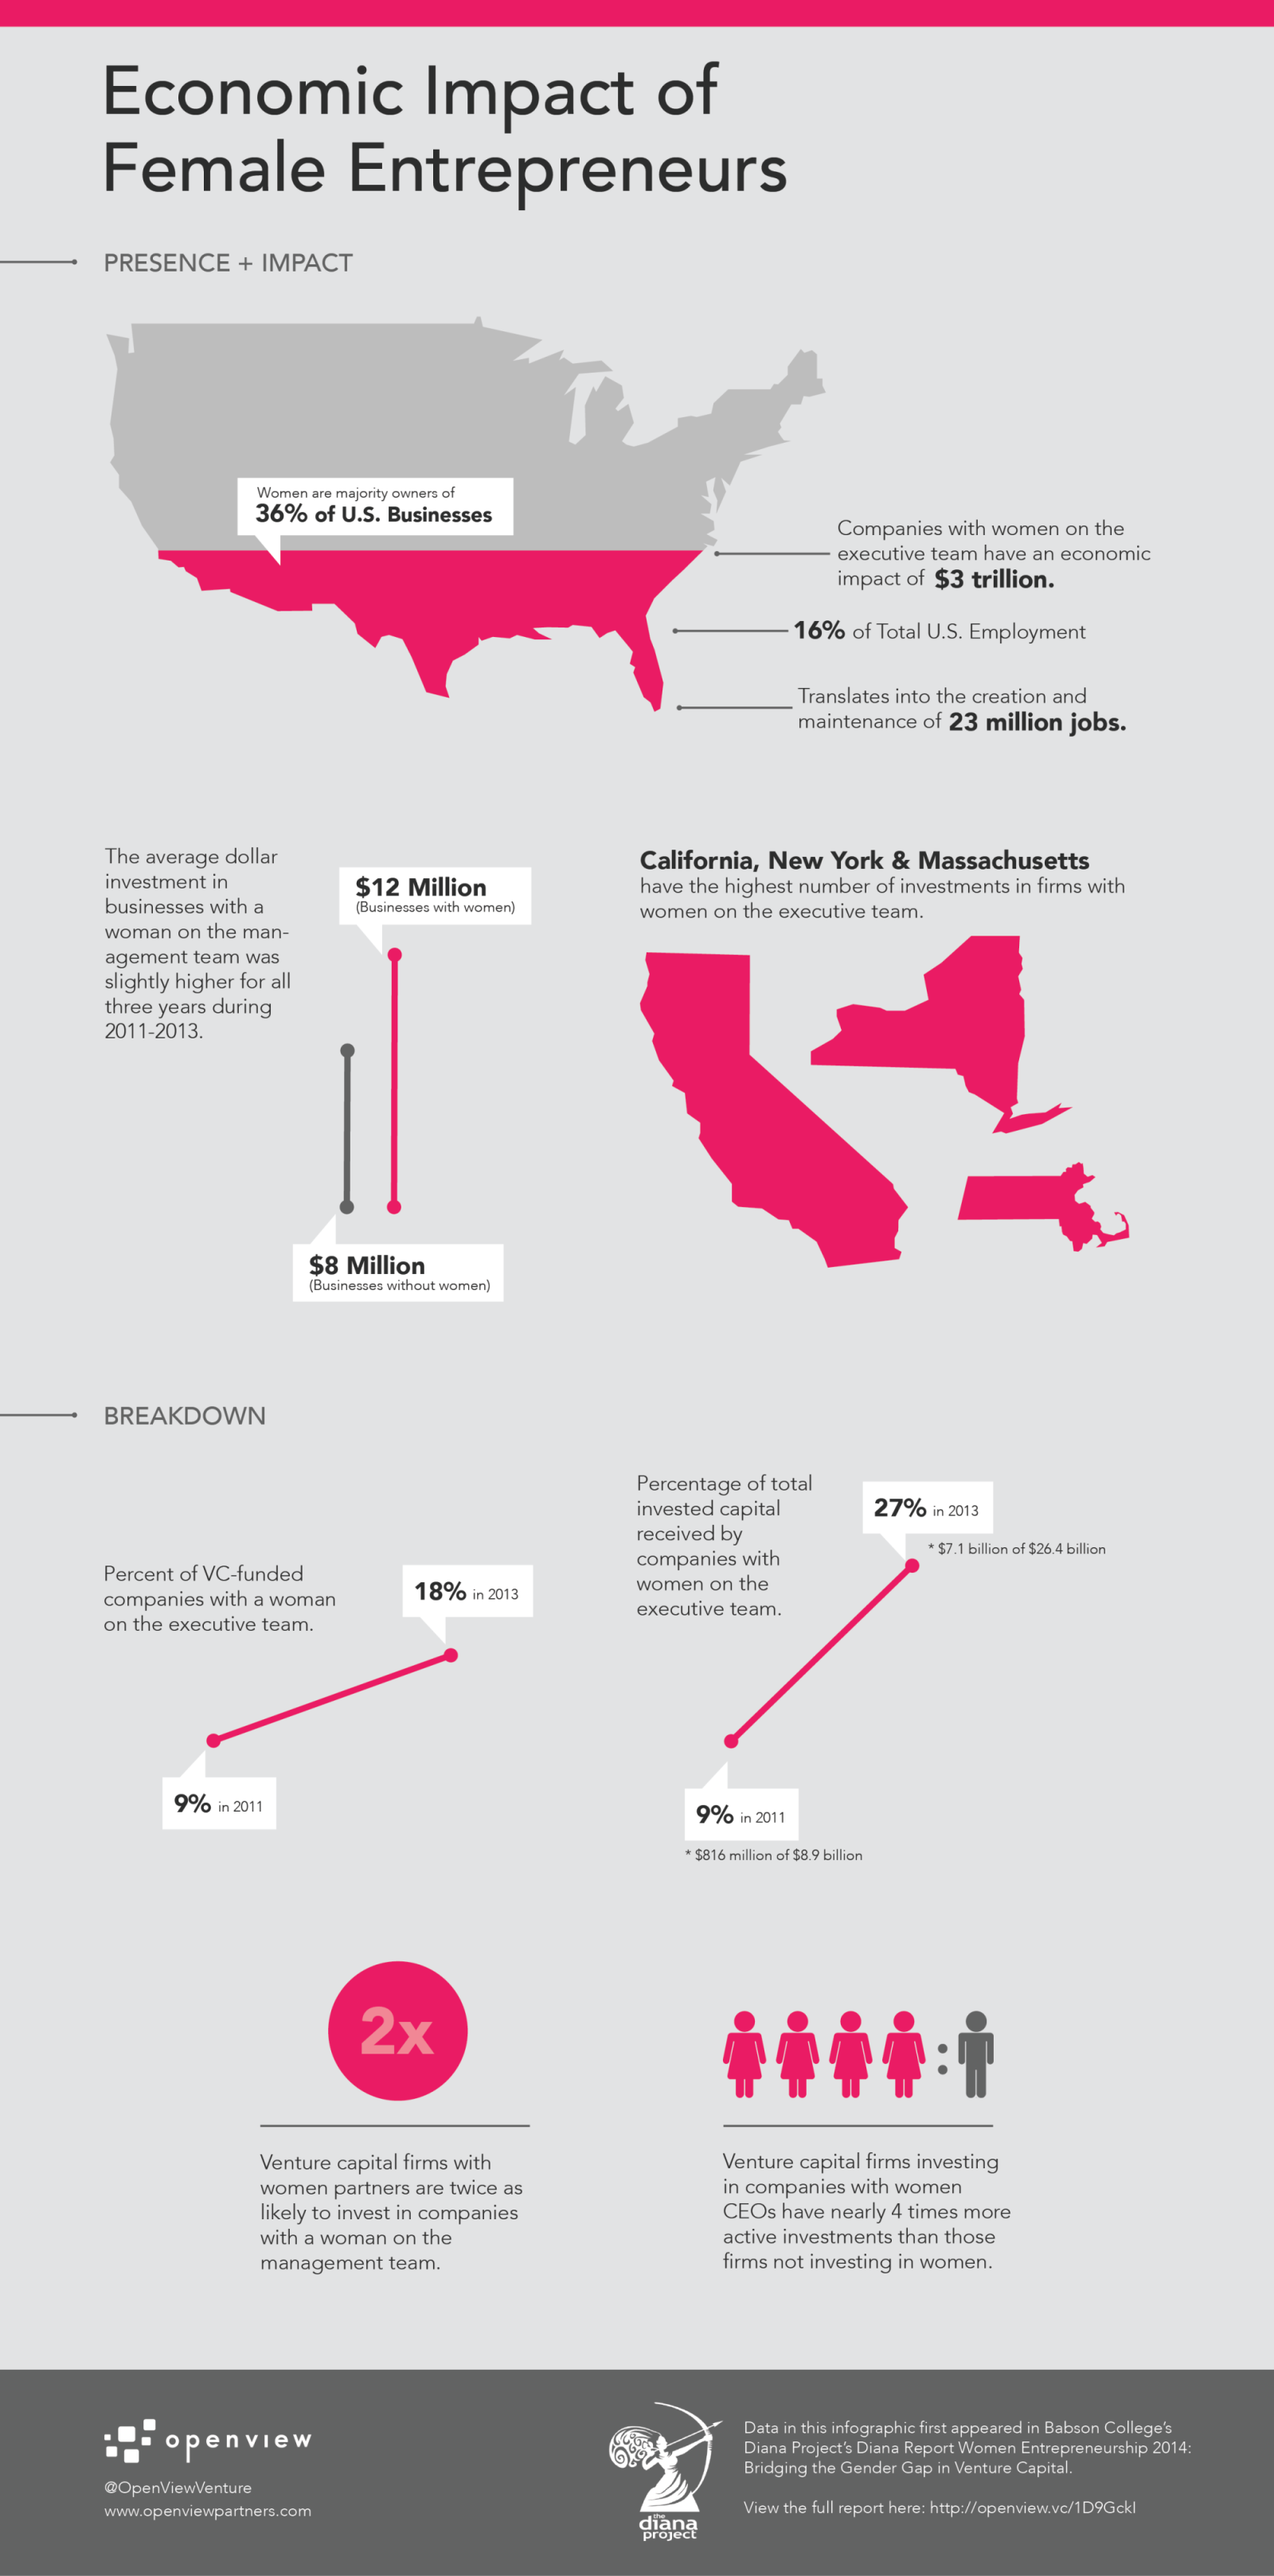 Economic Impact of Female Entrepreneurs